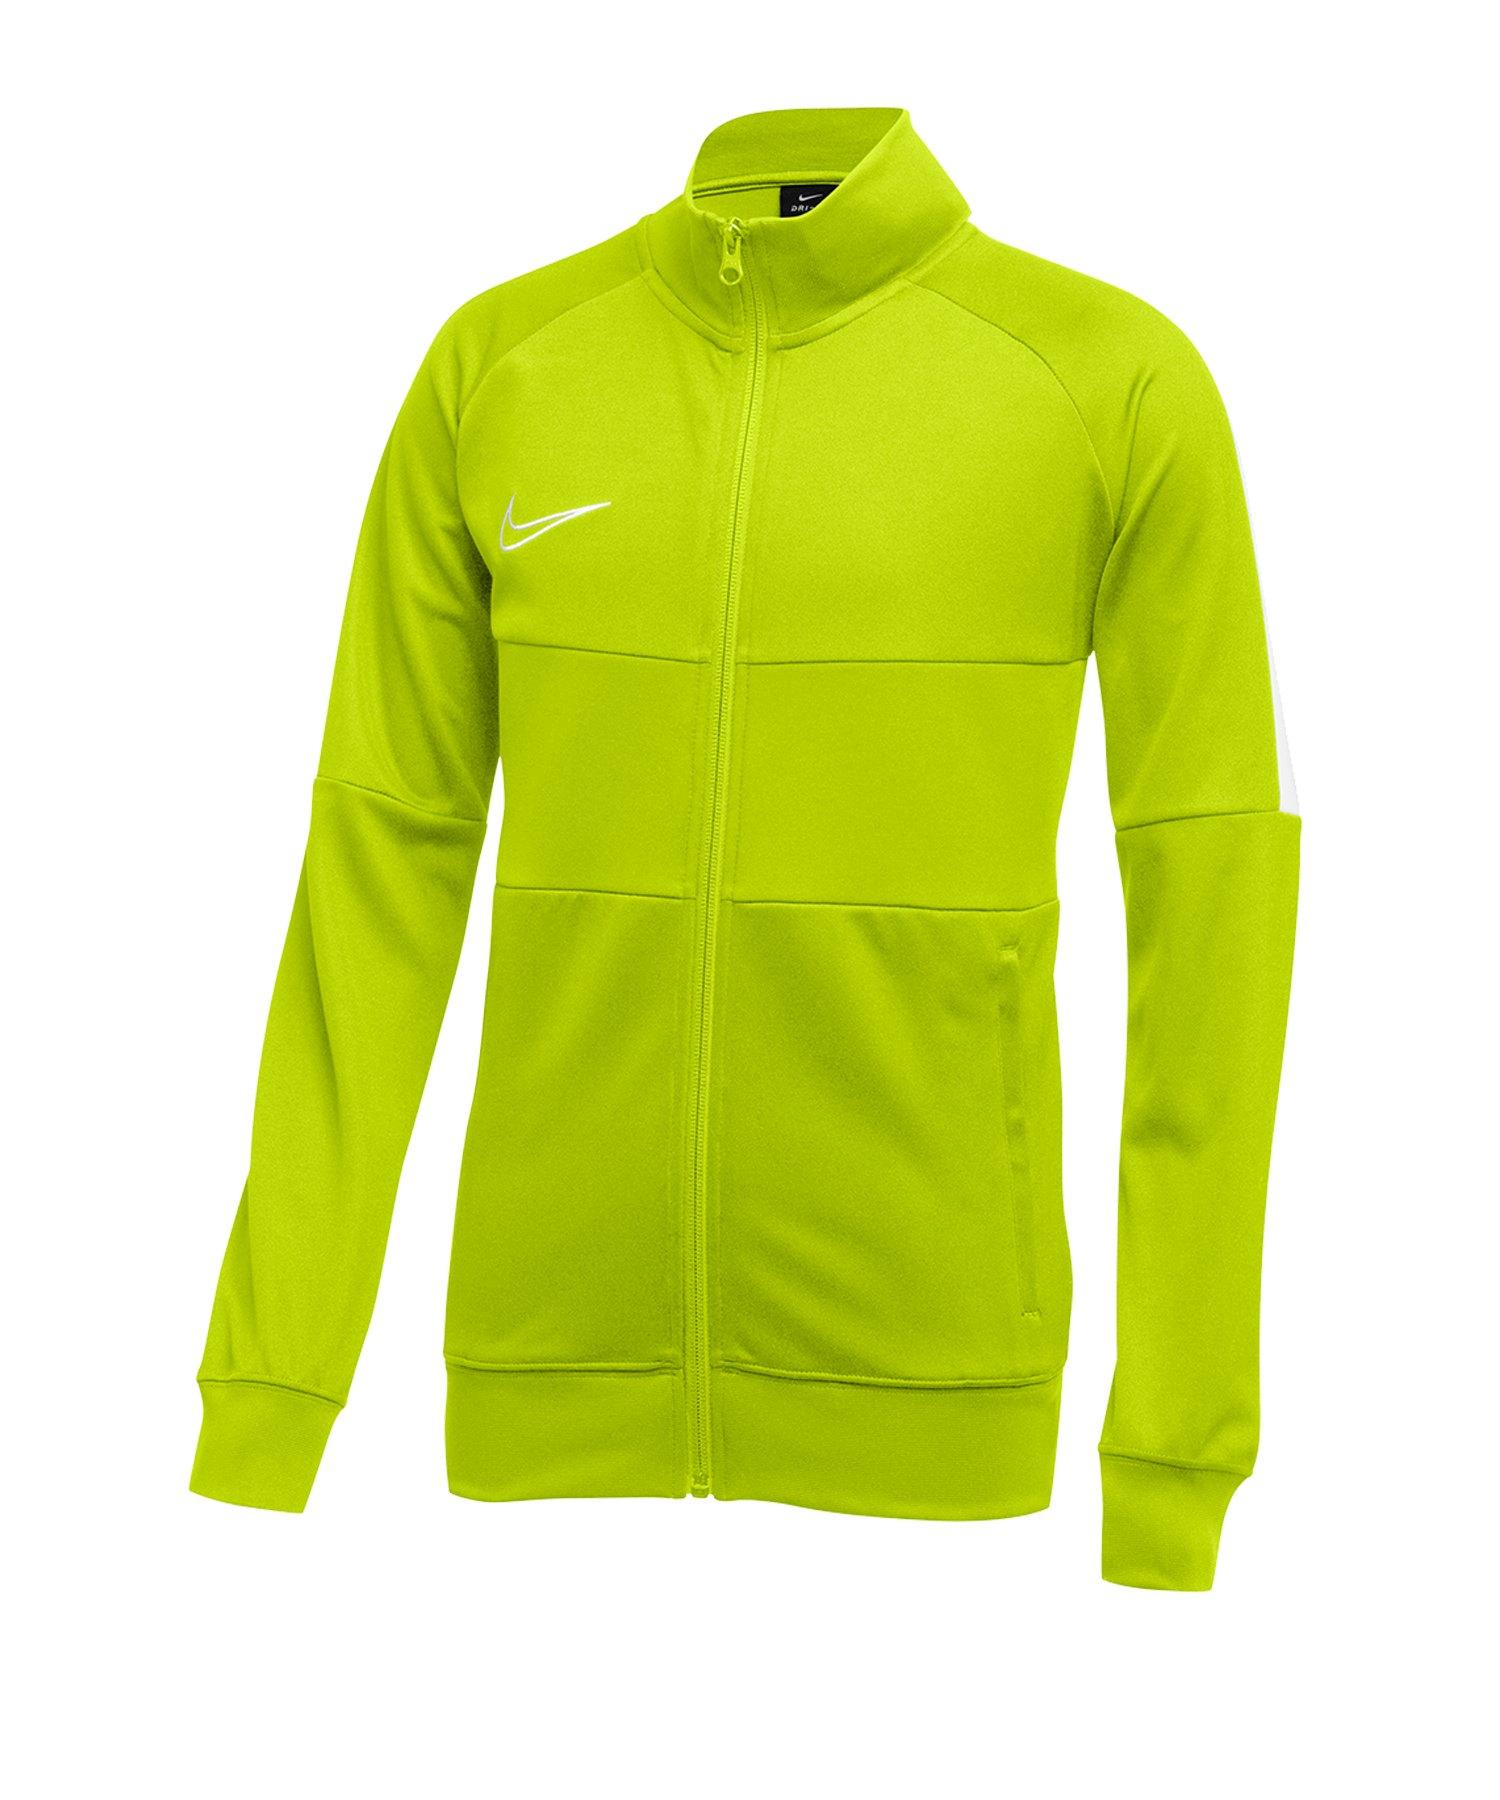 Nike Academy 19 Dri-Fit Jacke Kids Grün F702 - gruen